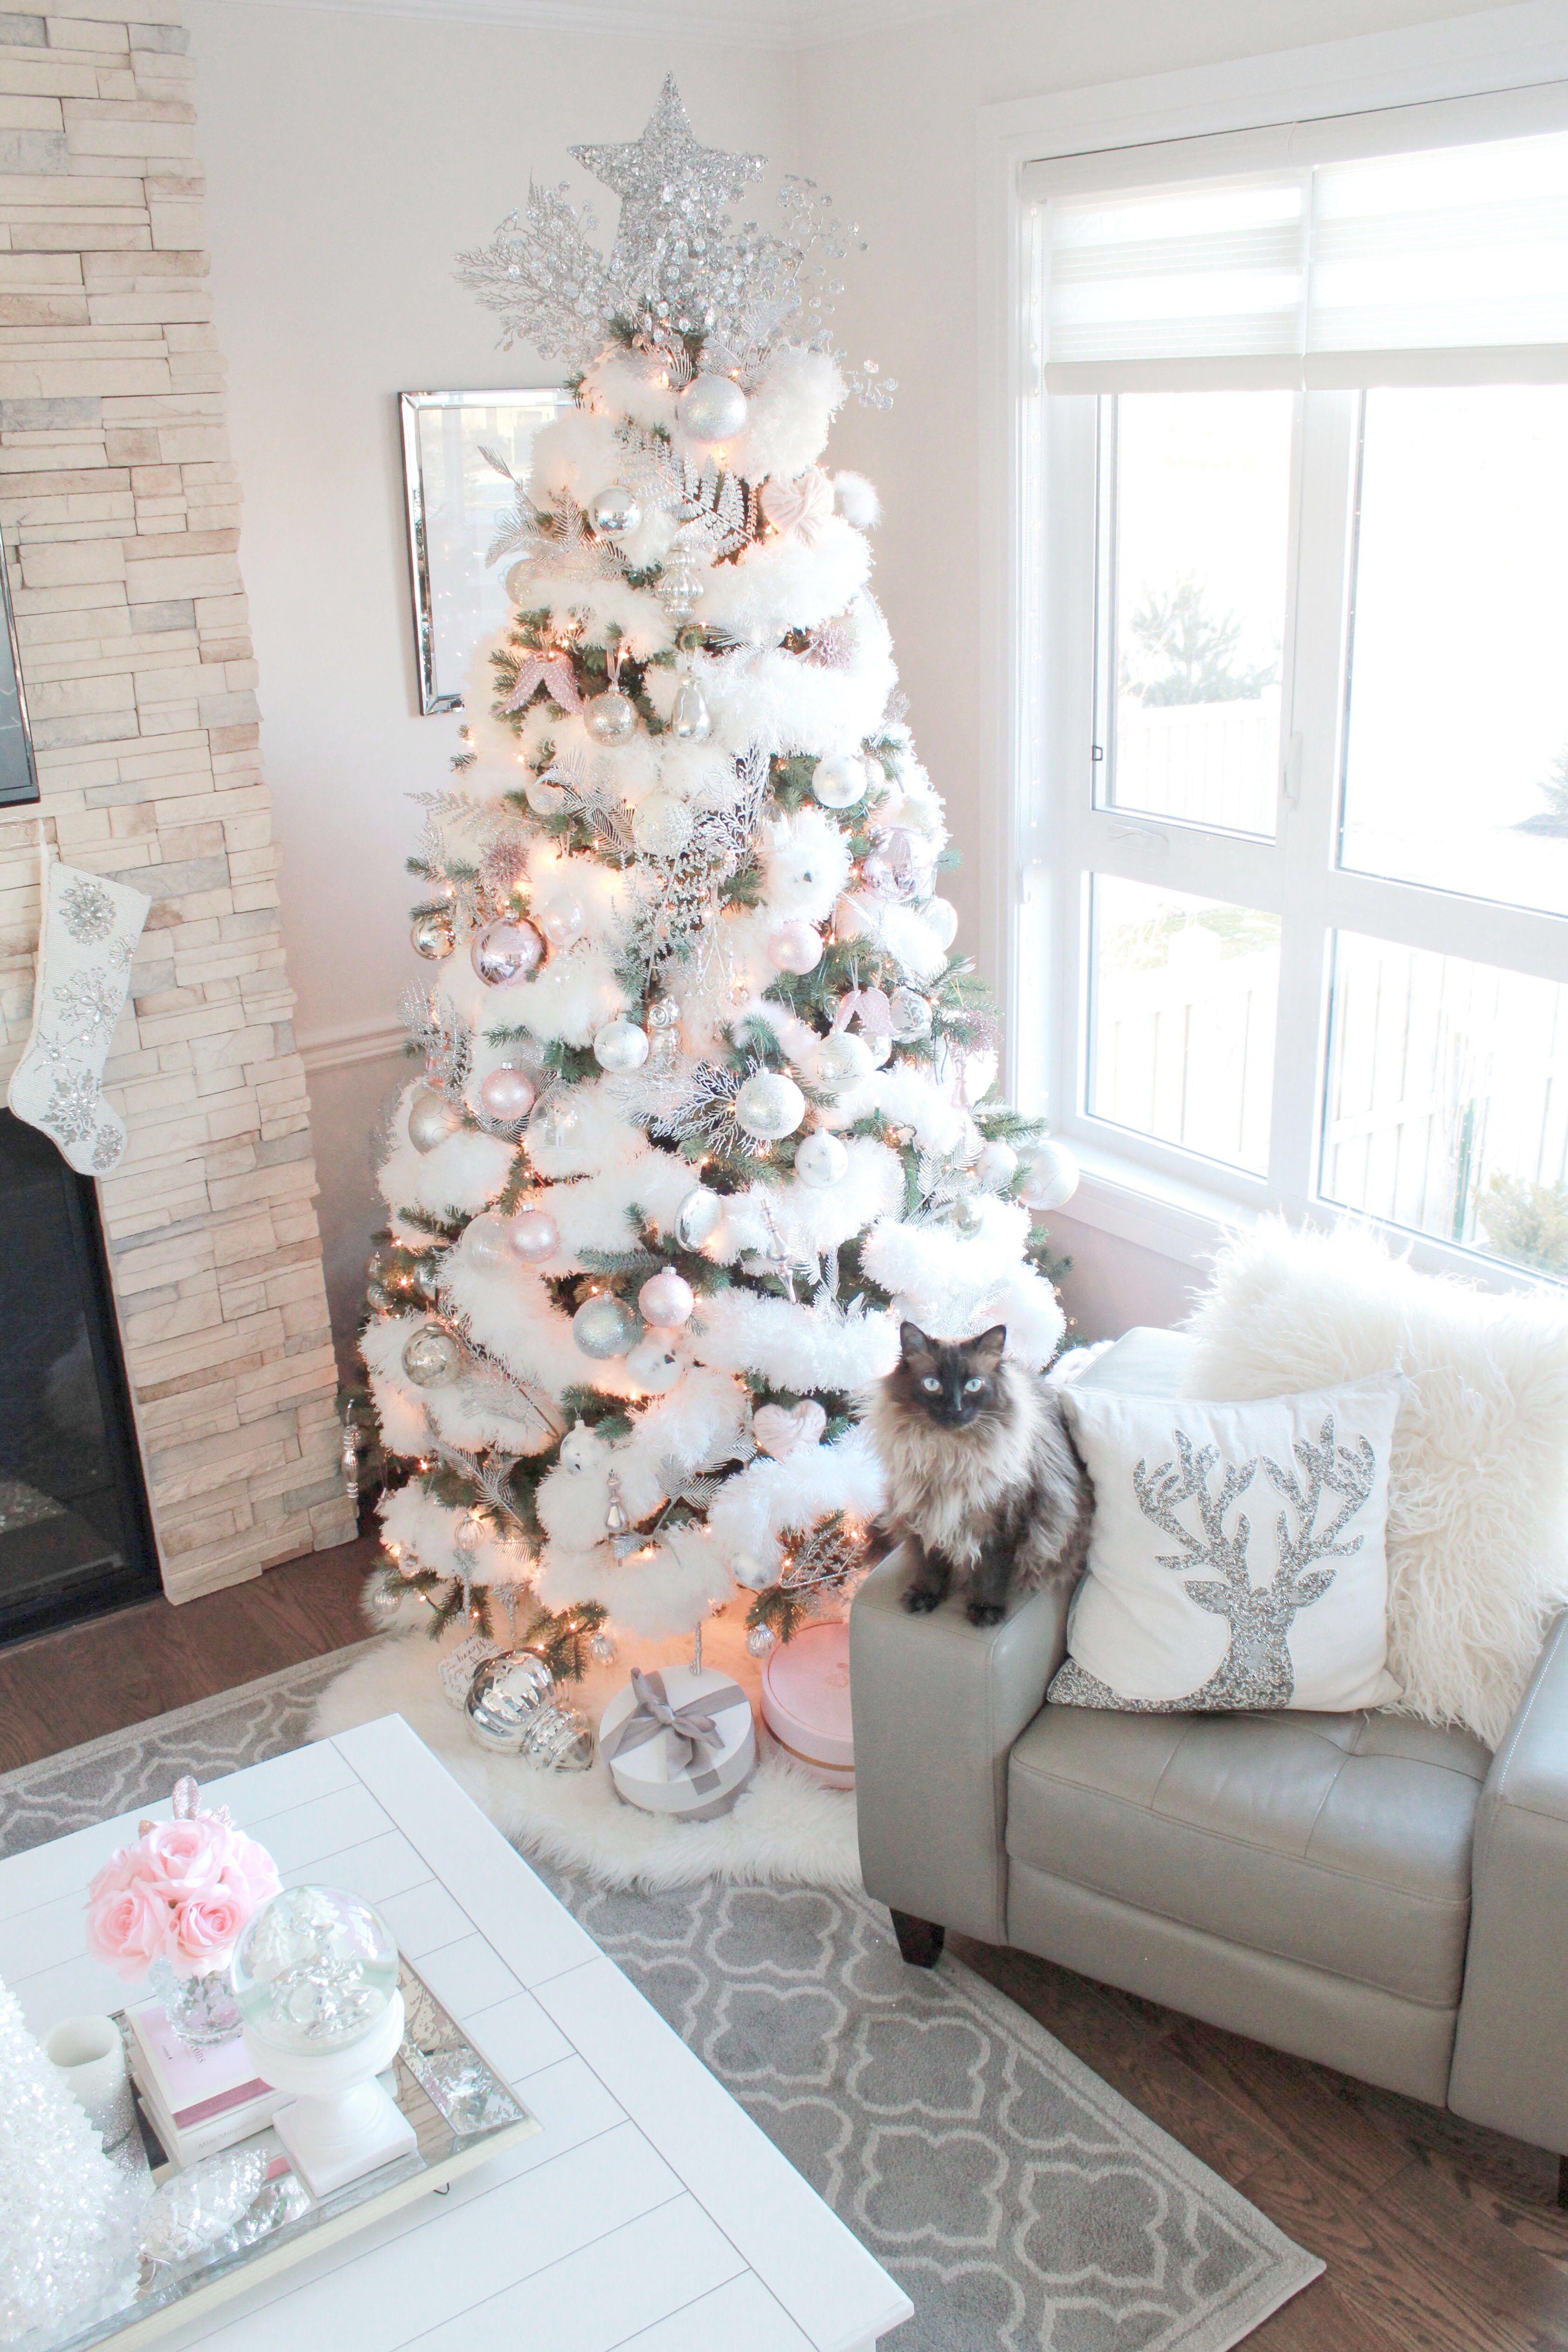 Clearance Christmas Trees 9 Ft but Christmas Lights ...